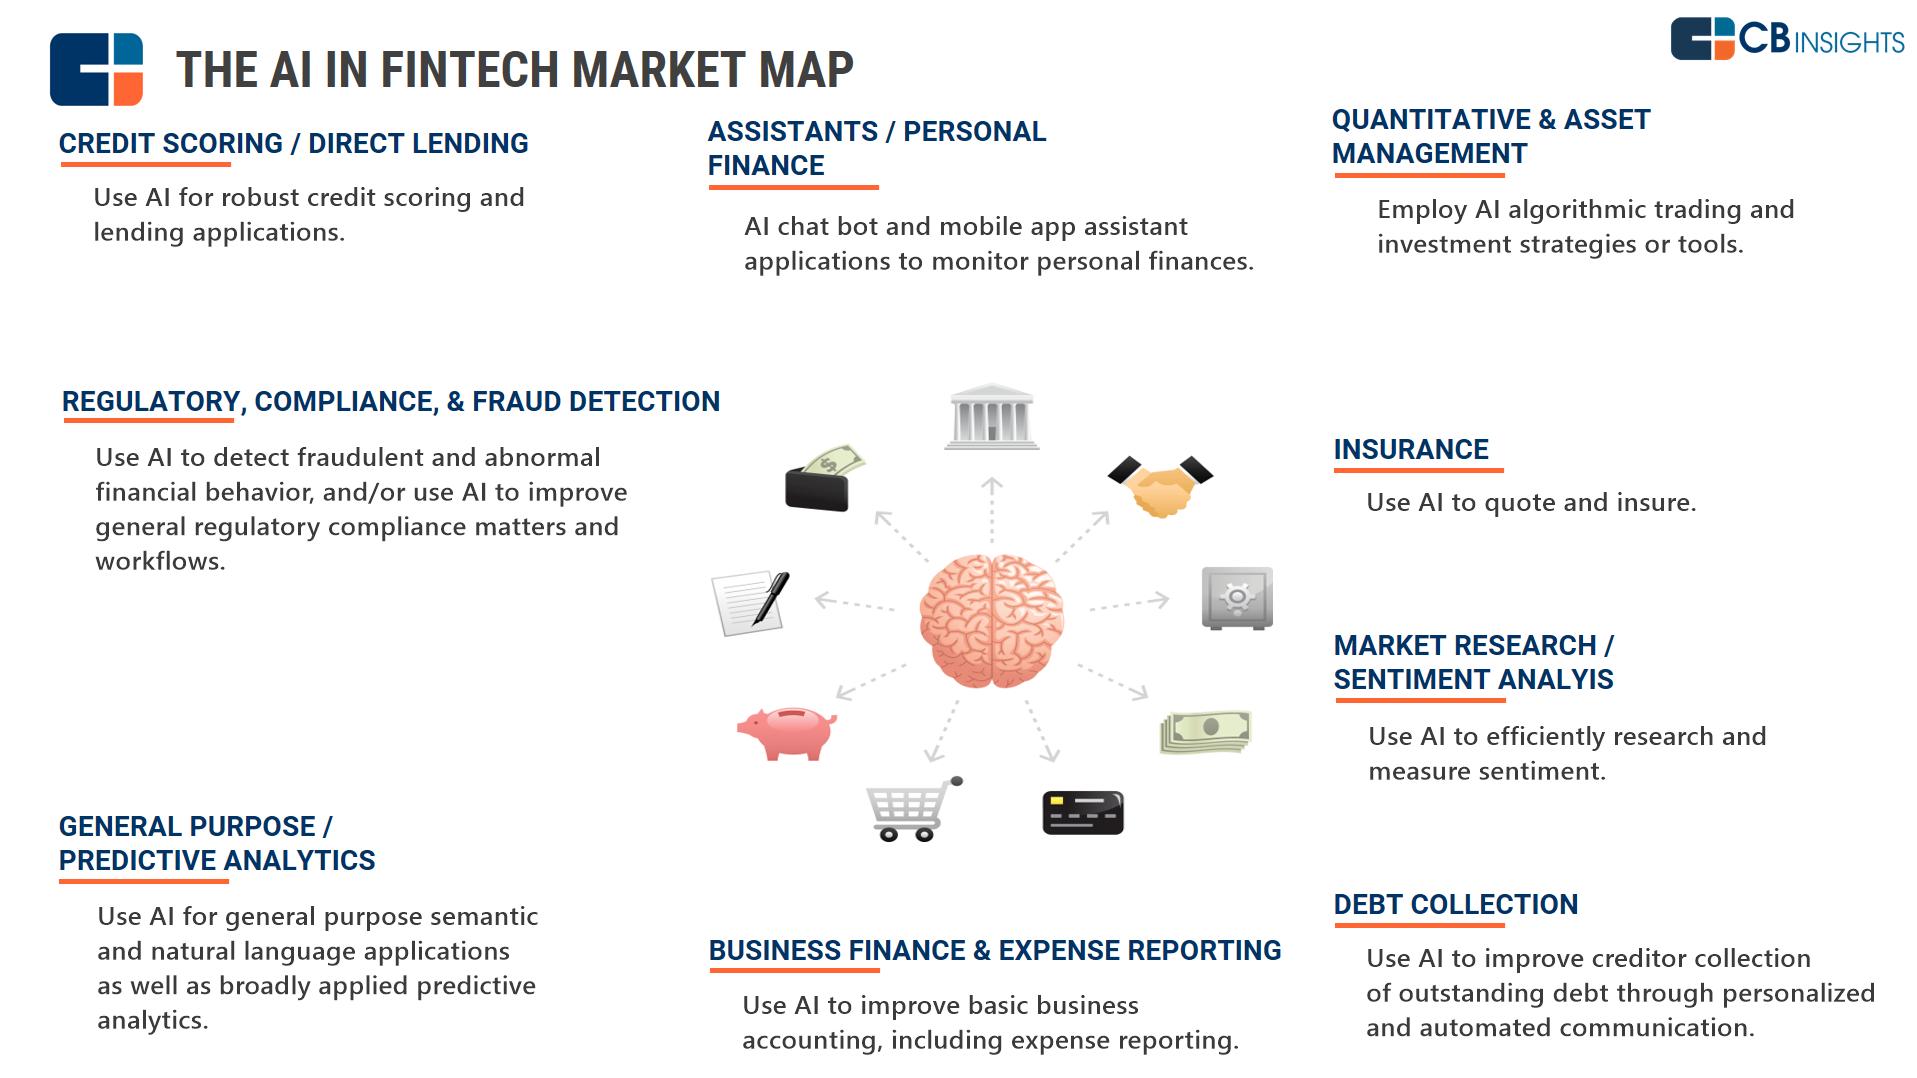 AI in fintech #ai #artificialintelligence #finance #trends